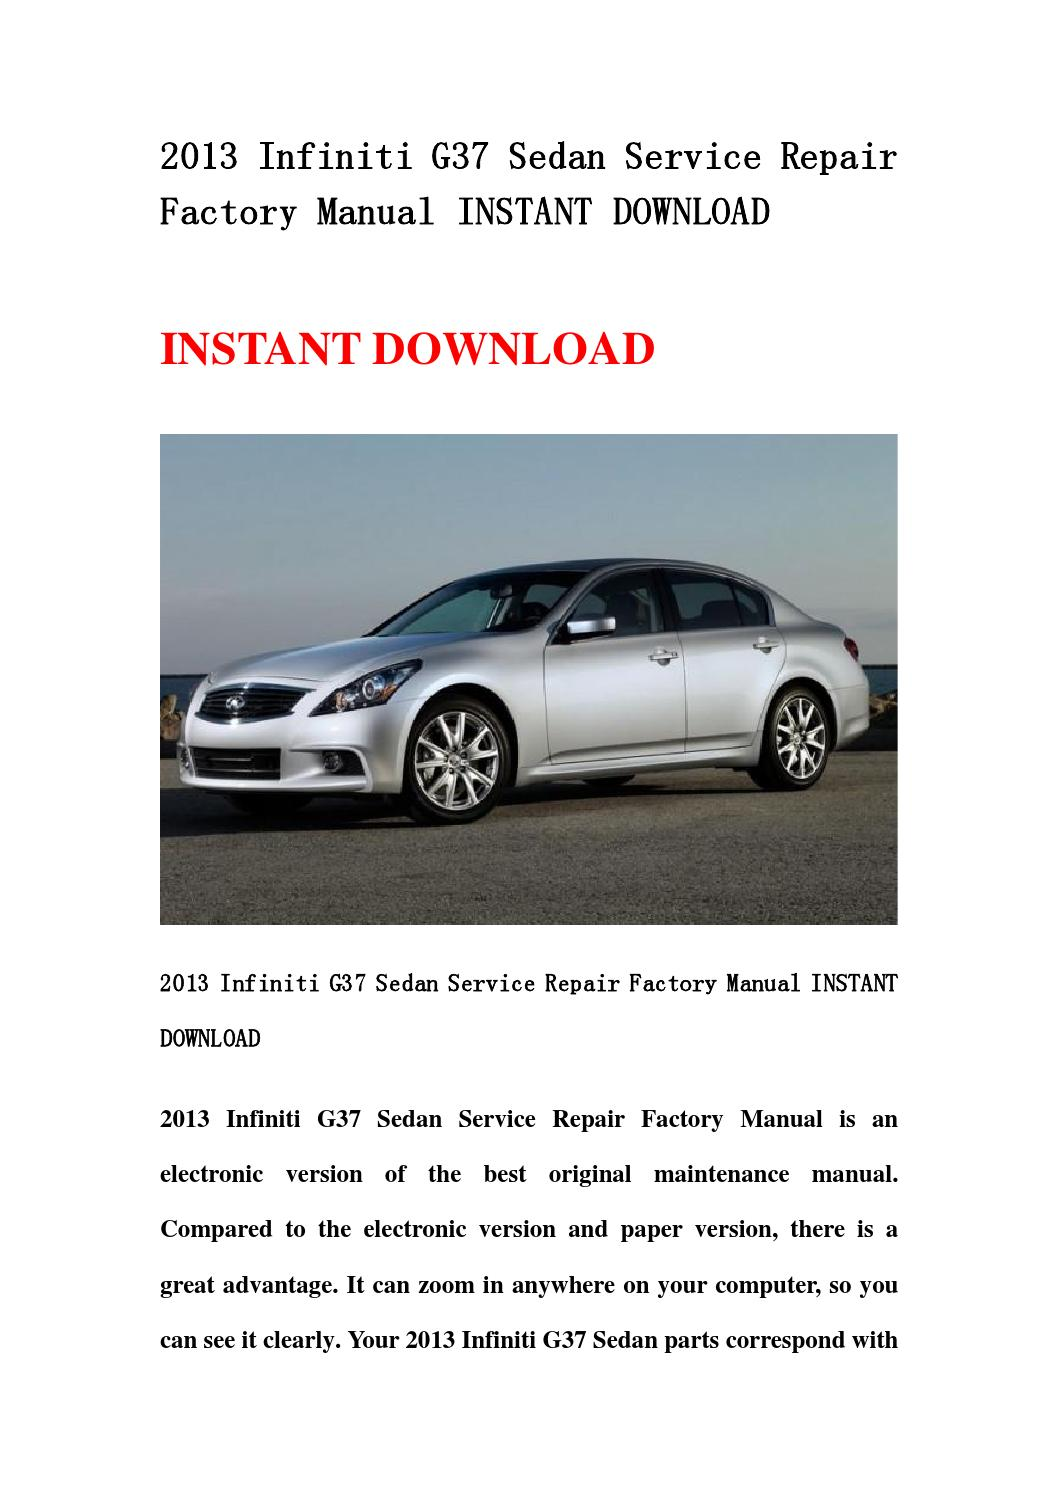 2013 infiniti g37 service manual